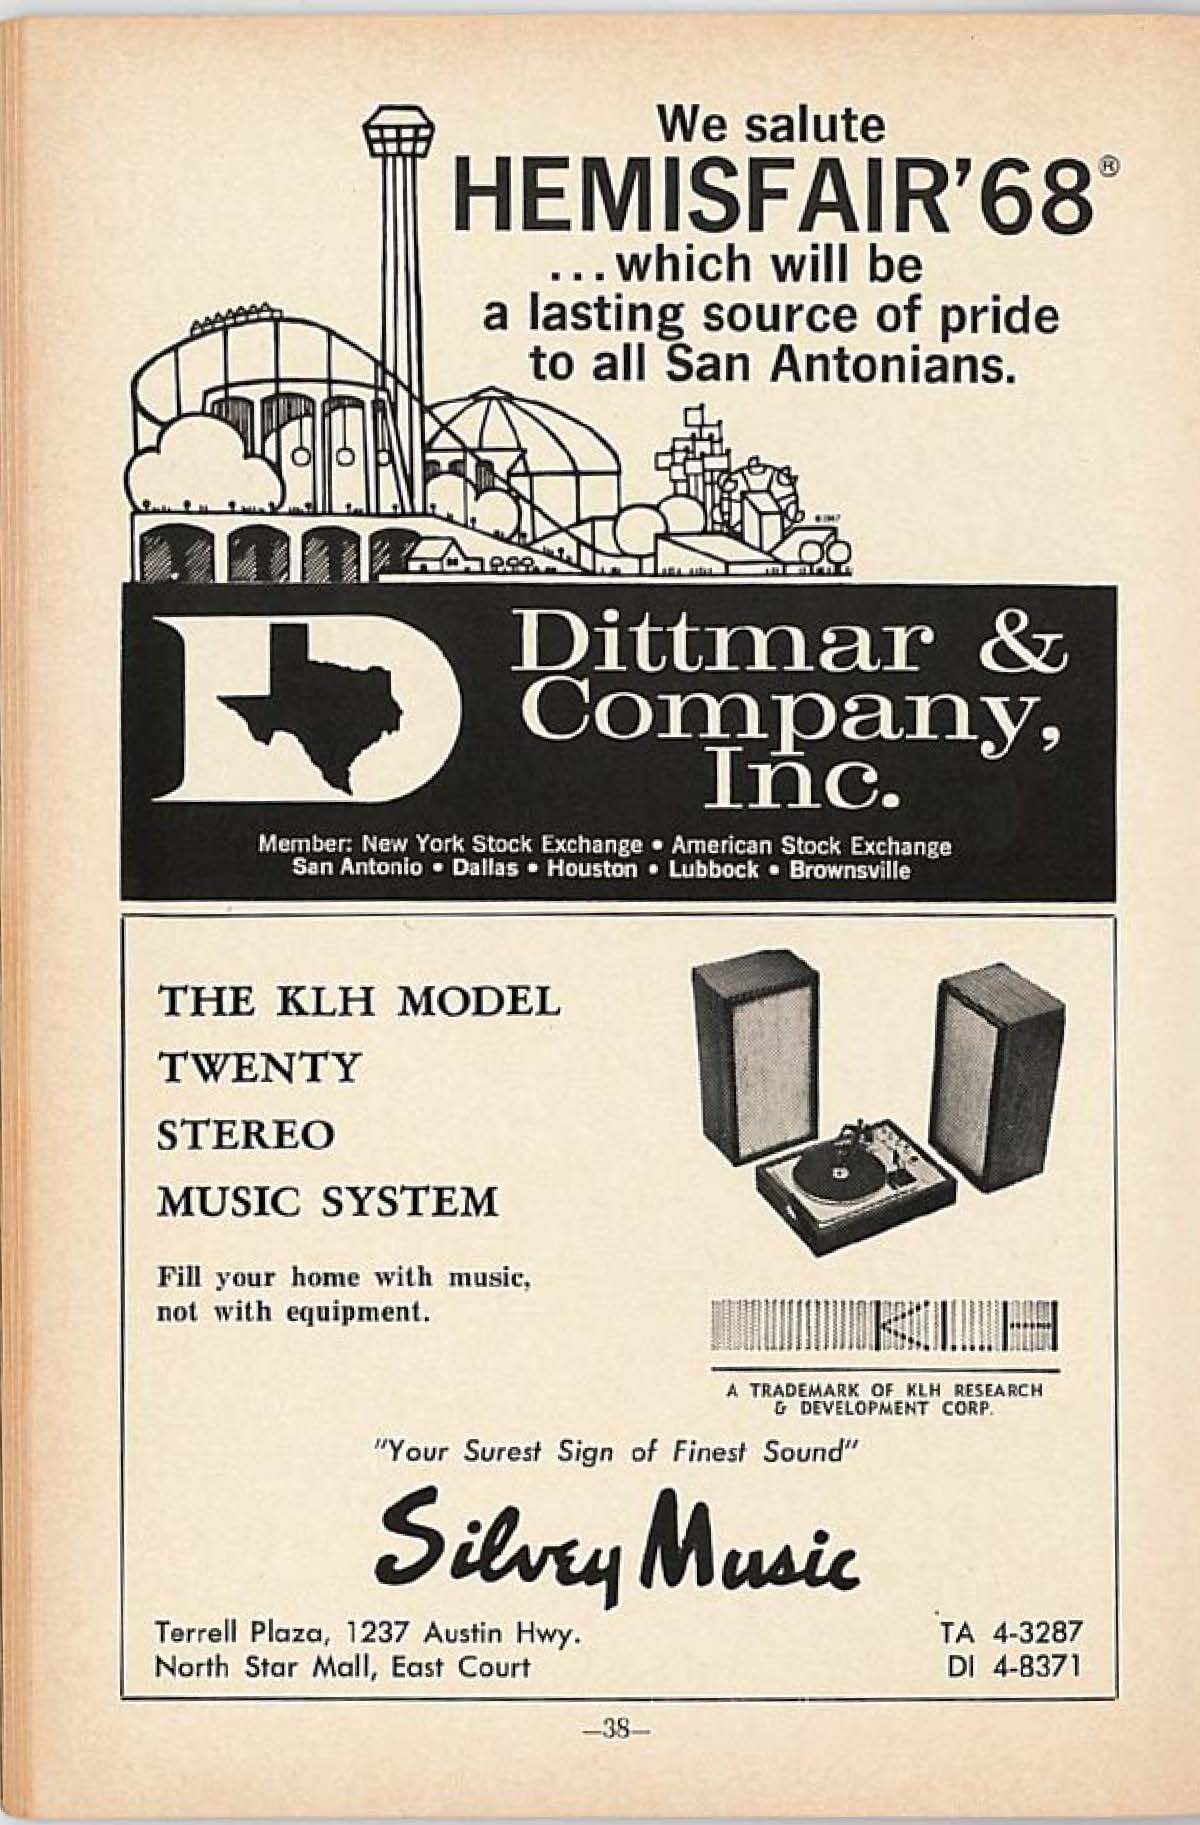 1968 Program_Page_18.jpg